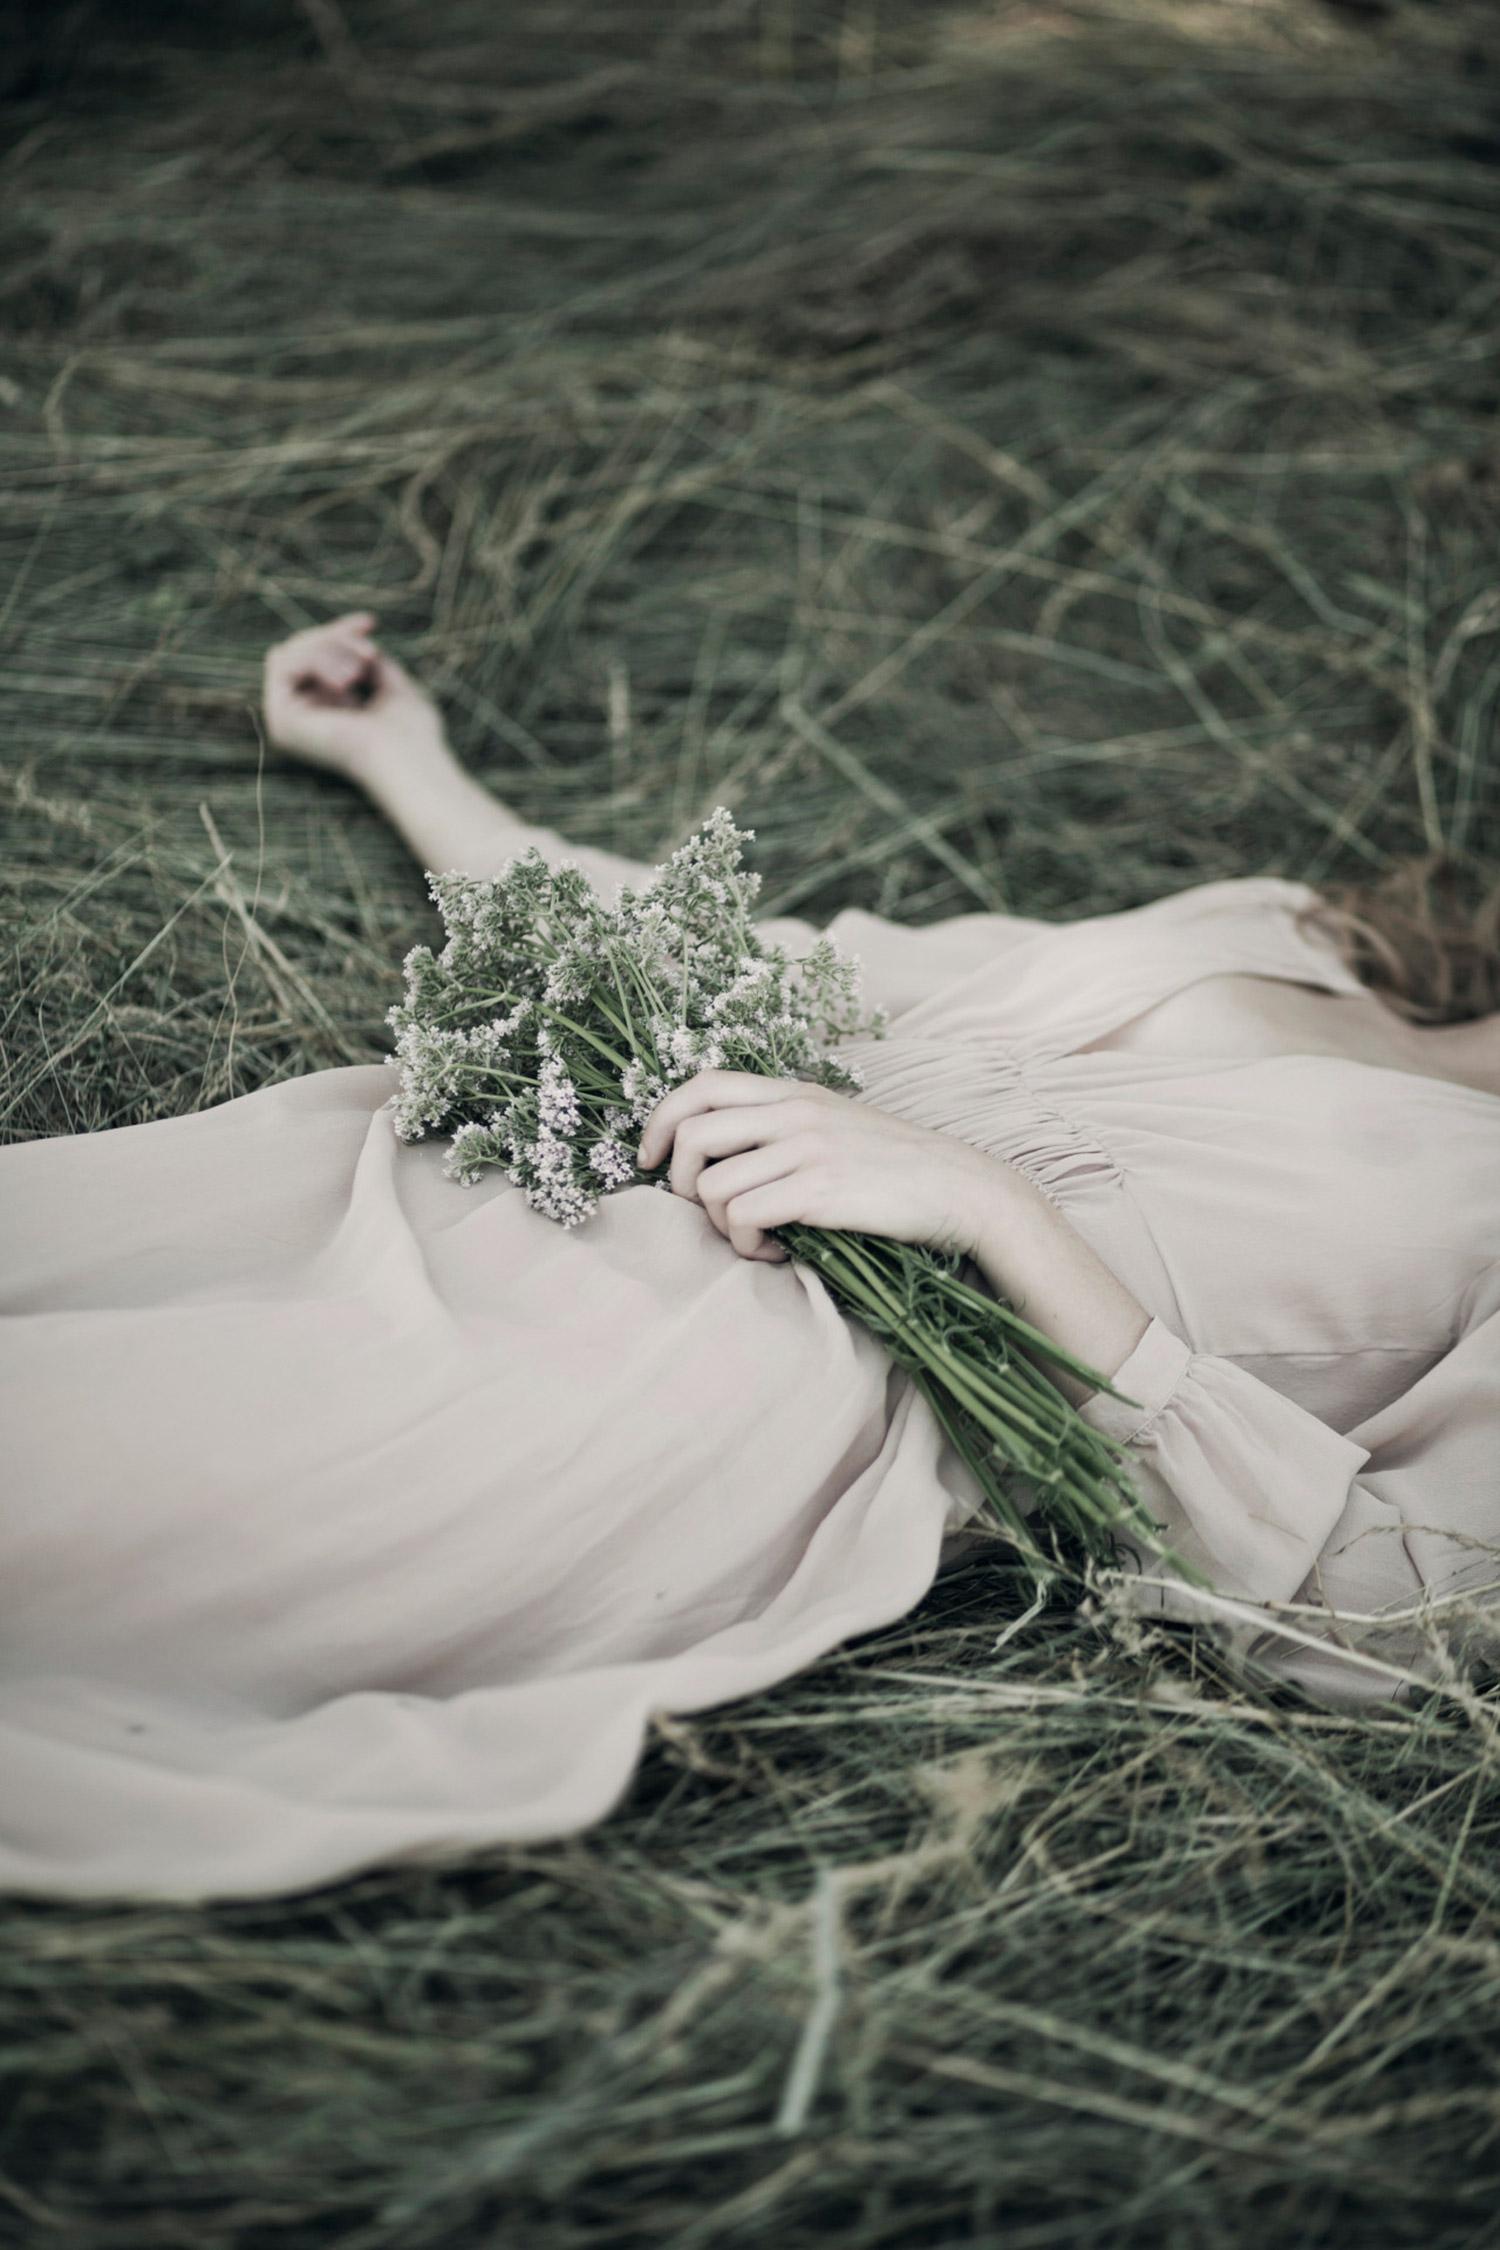 Monia Merlo - lying on grass